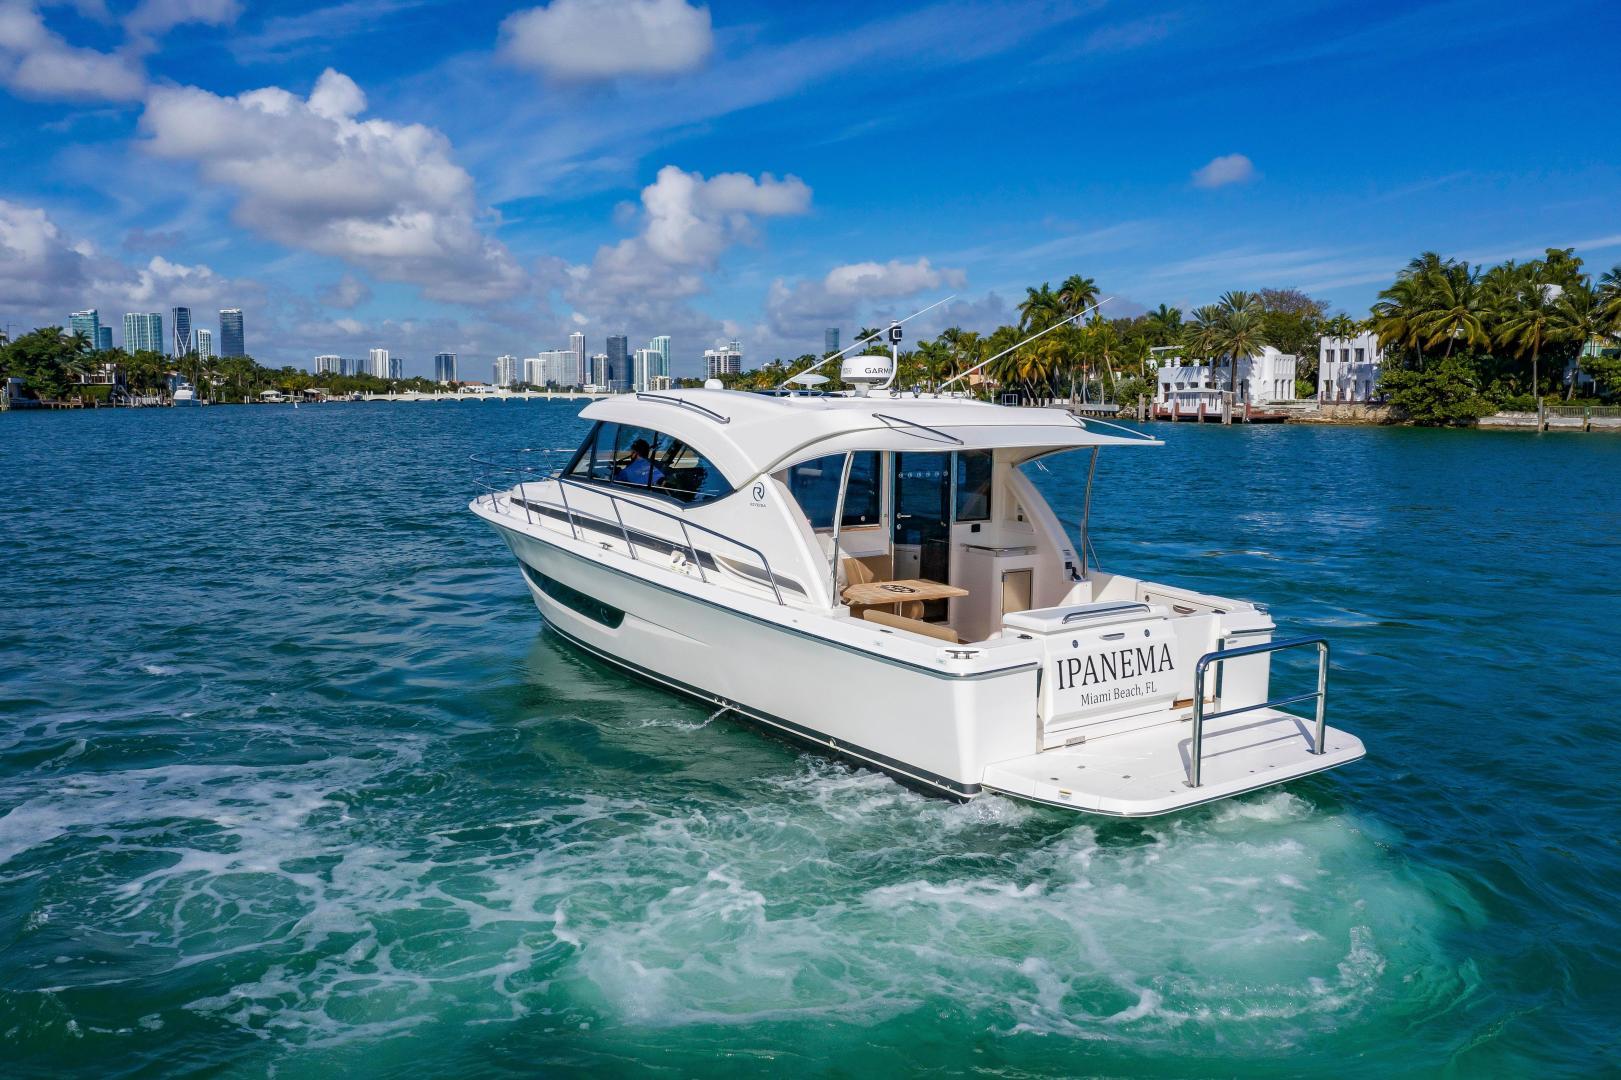 Riviera-395 SUV 2019-Ipanema Miami Beach-Florida-United States-1614873   Thumbnail